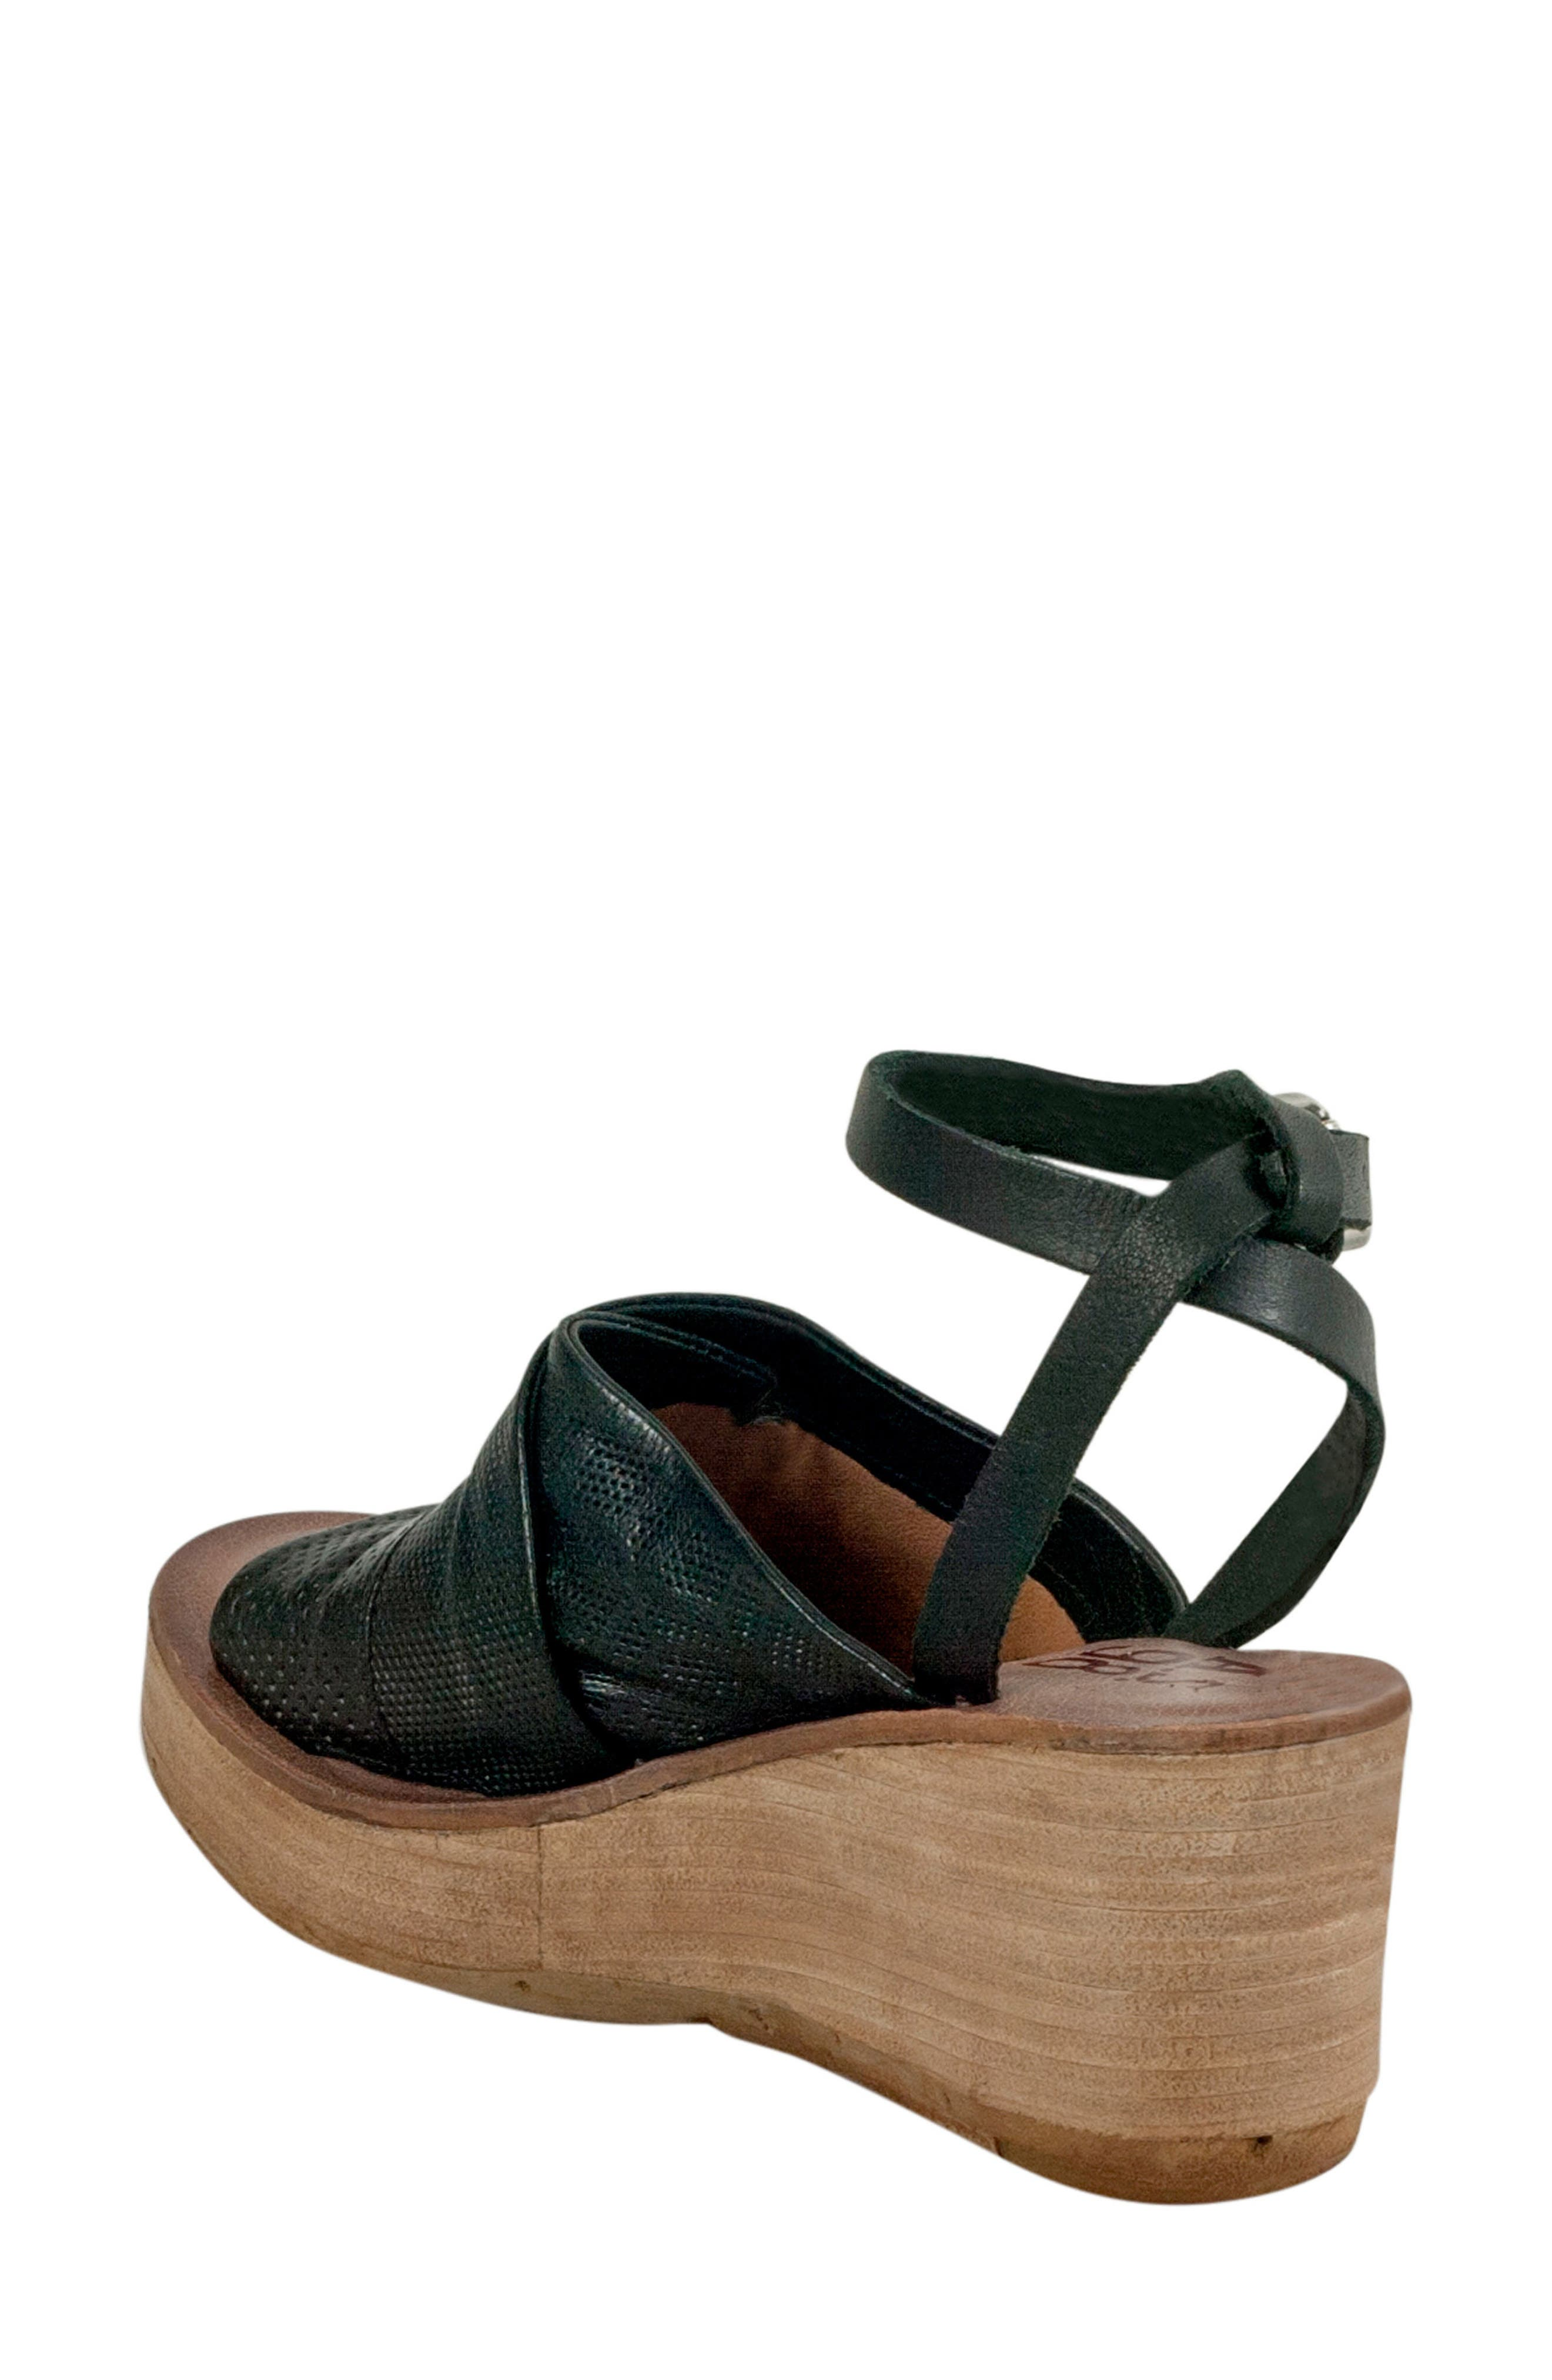 Niall Platform Wedge Sandal,                             Alternate thumbnail 3, color,